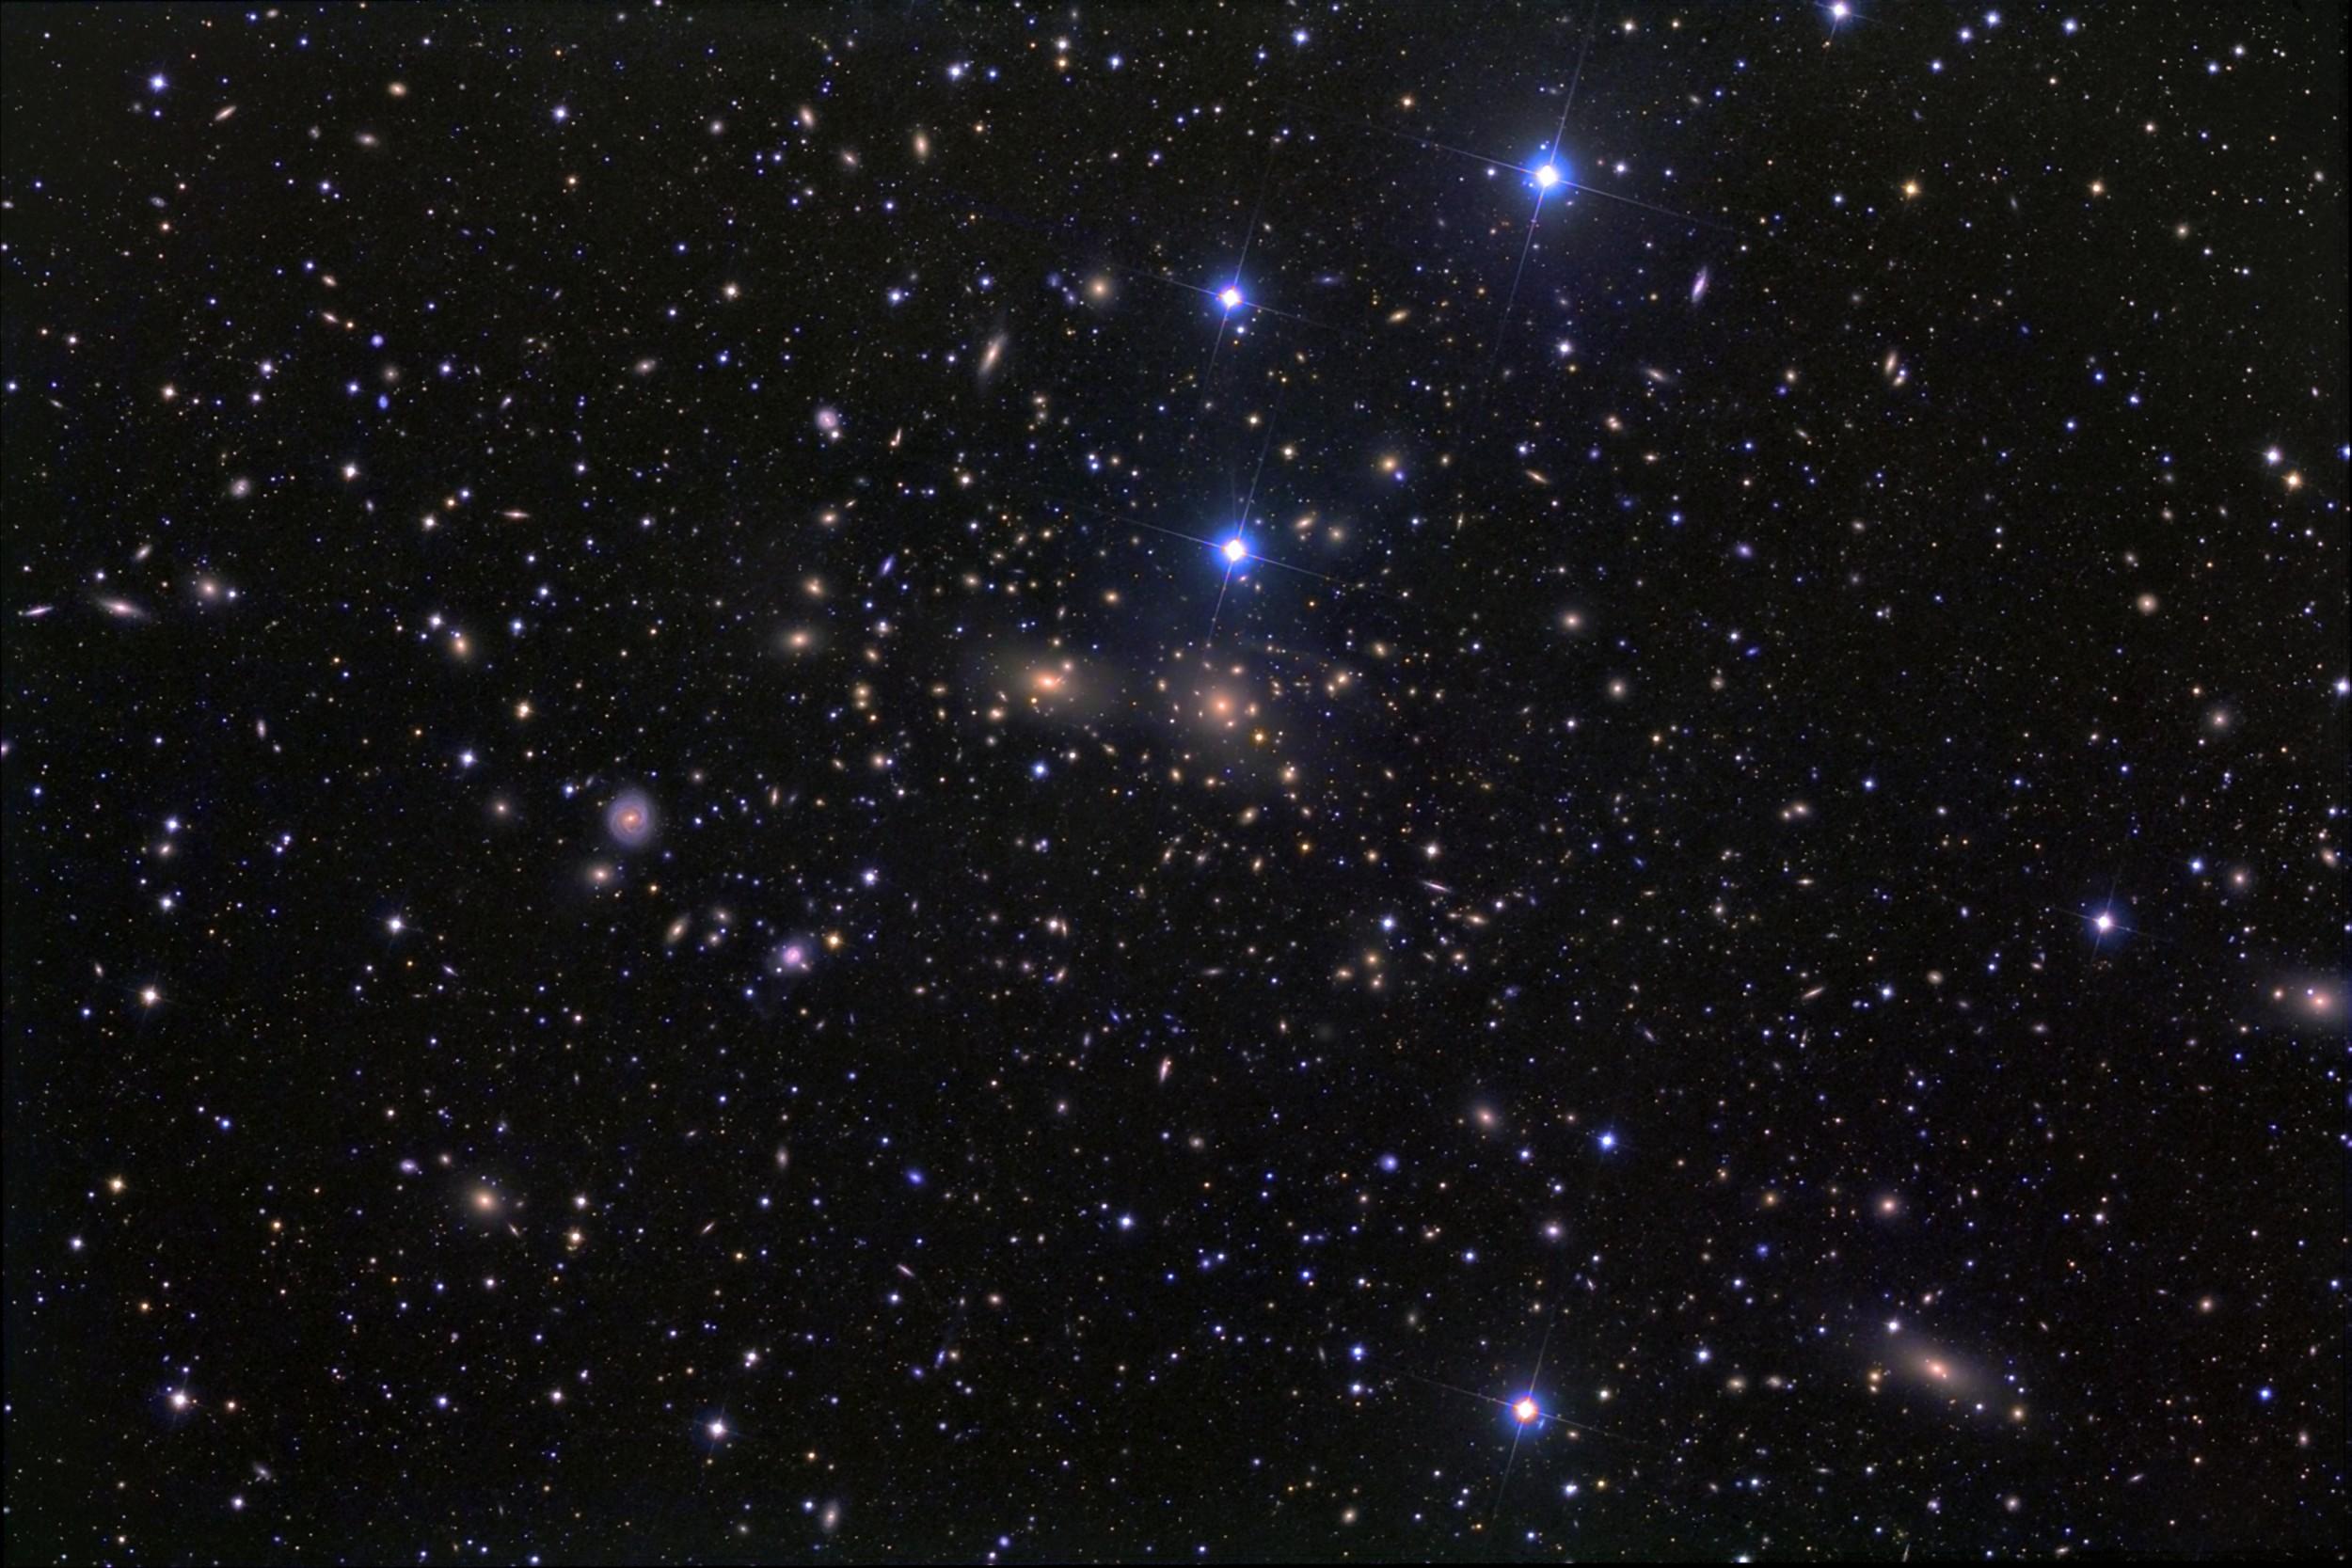 milky way galaxy cluster - photo #19